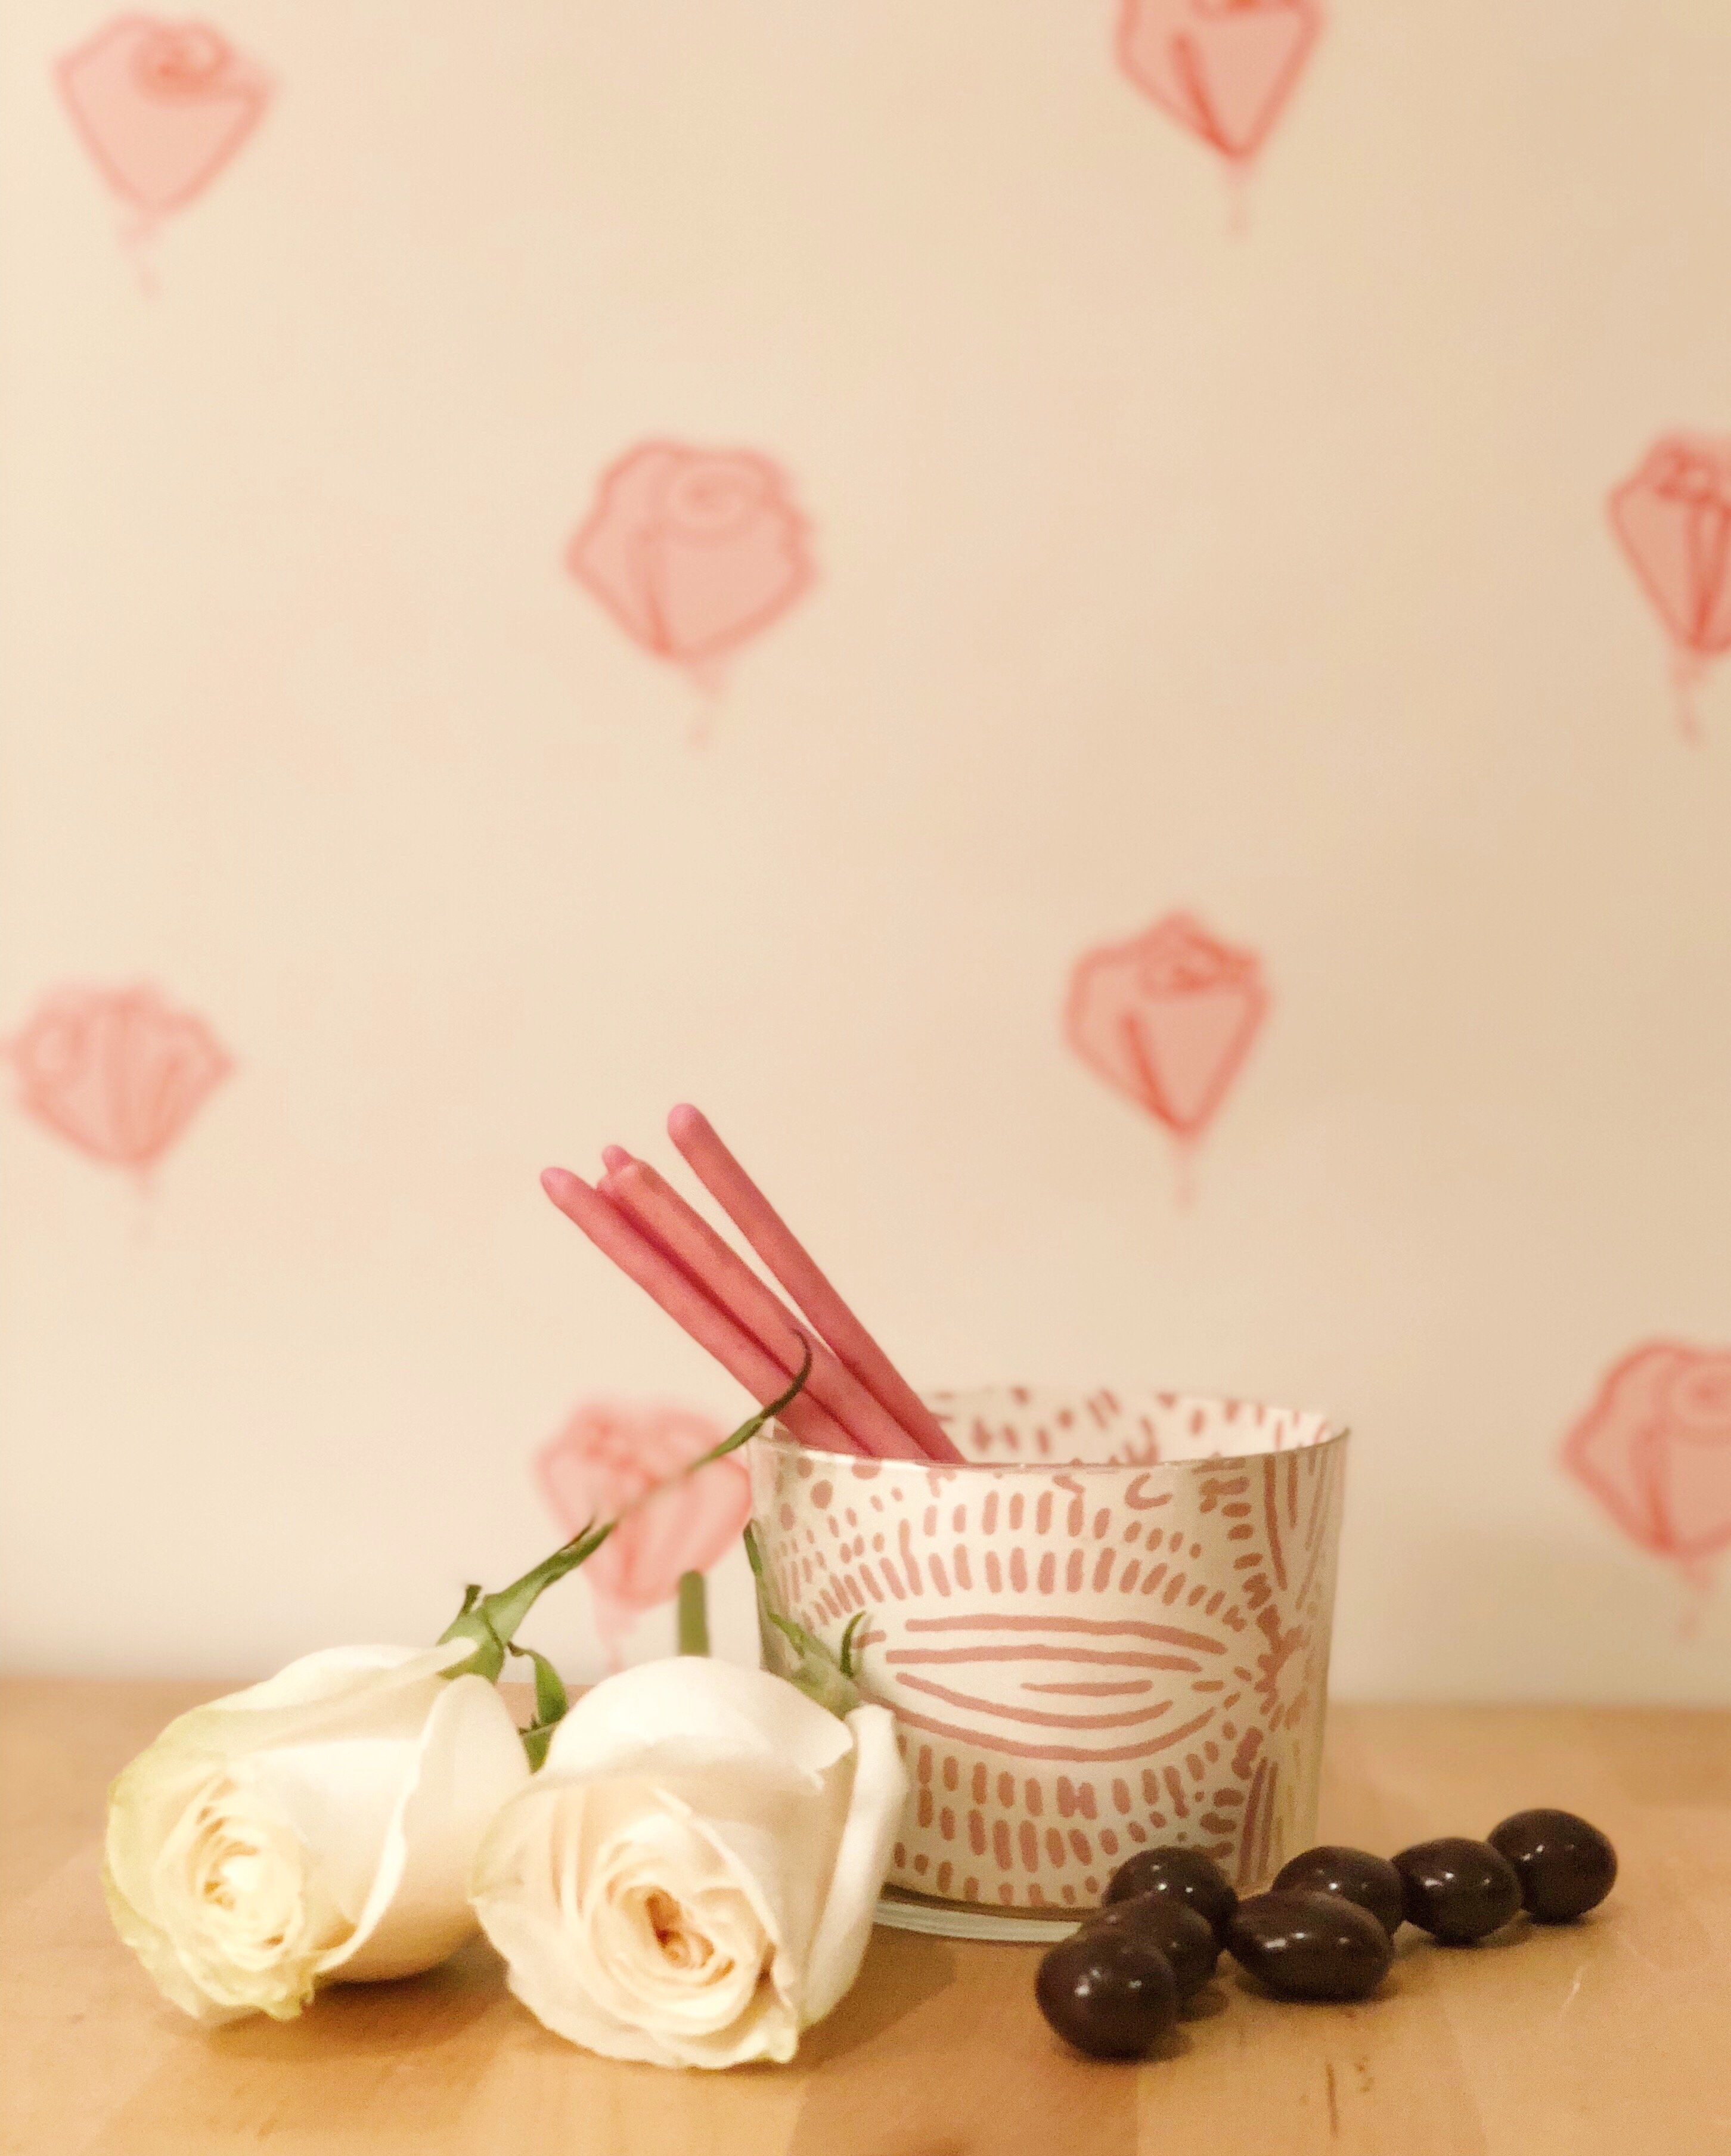 Pattern Stories Wallpaper Crafts Valentines Wallpaper Making Spirits Bright Flower wallpaper zoom zoom backgrounds